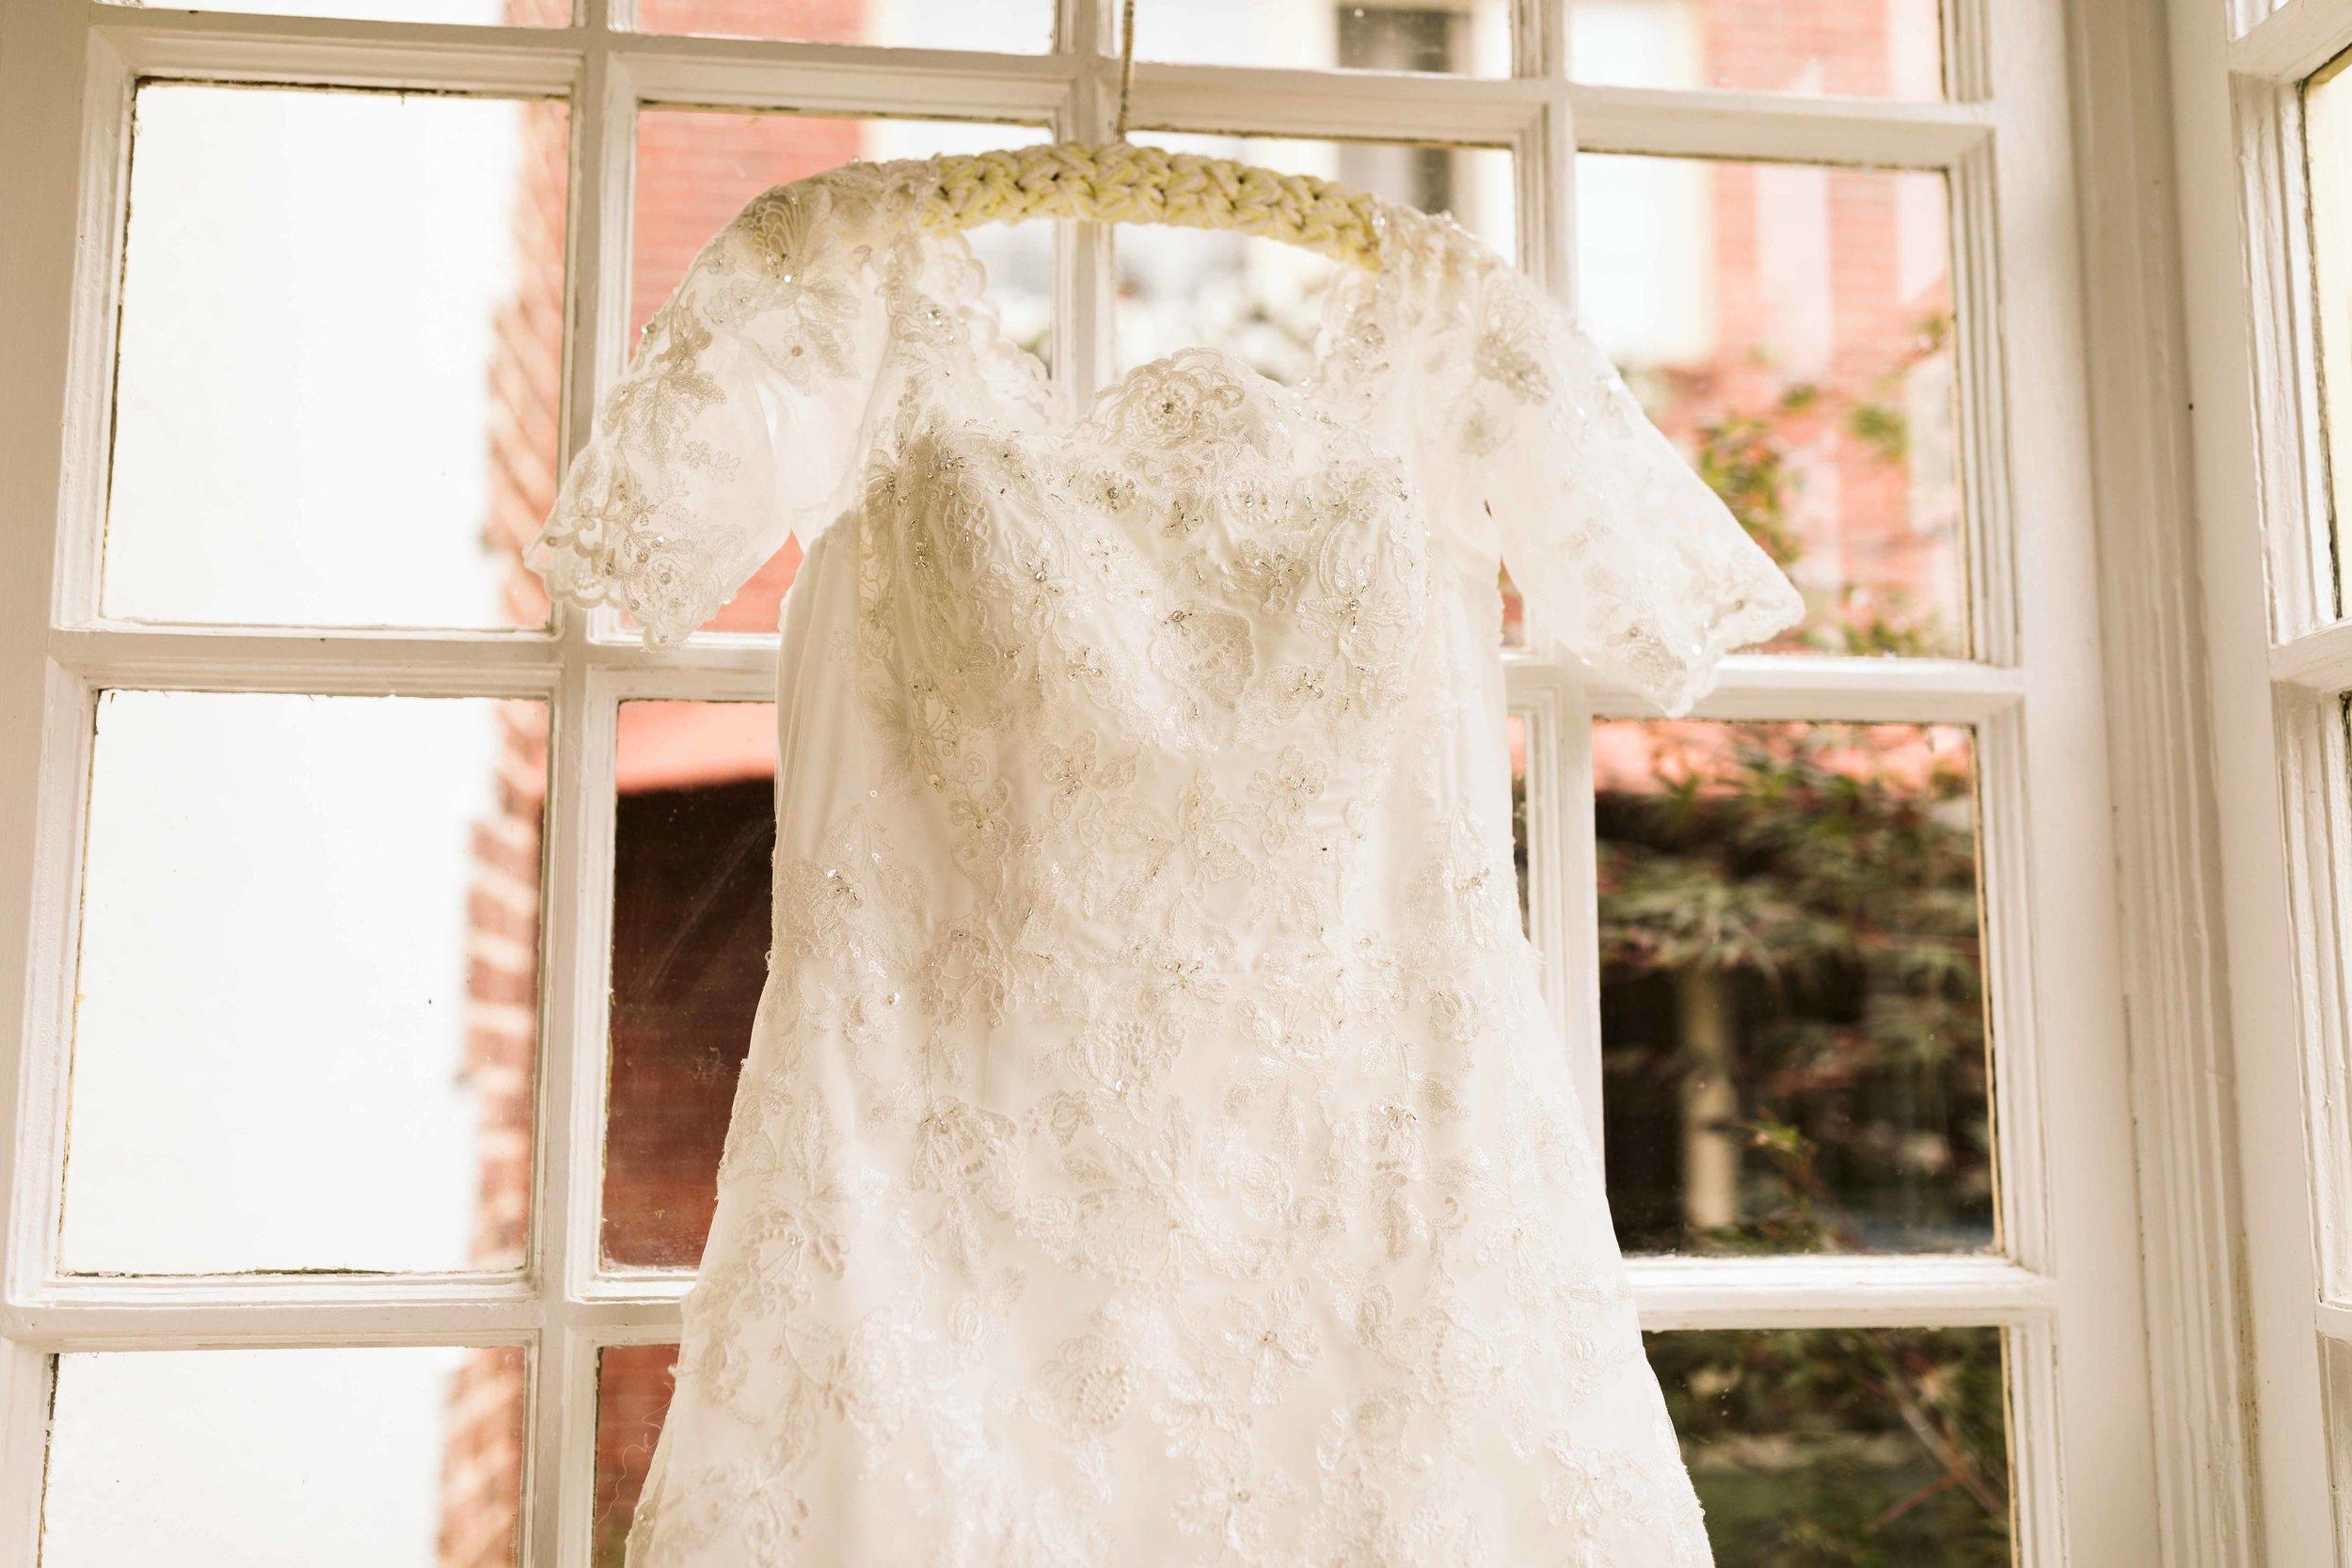 lairmont-manor-wedding-8.jpg